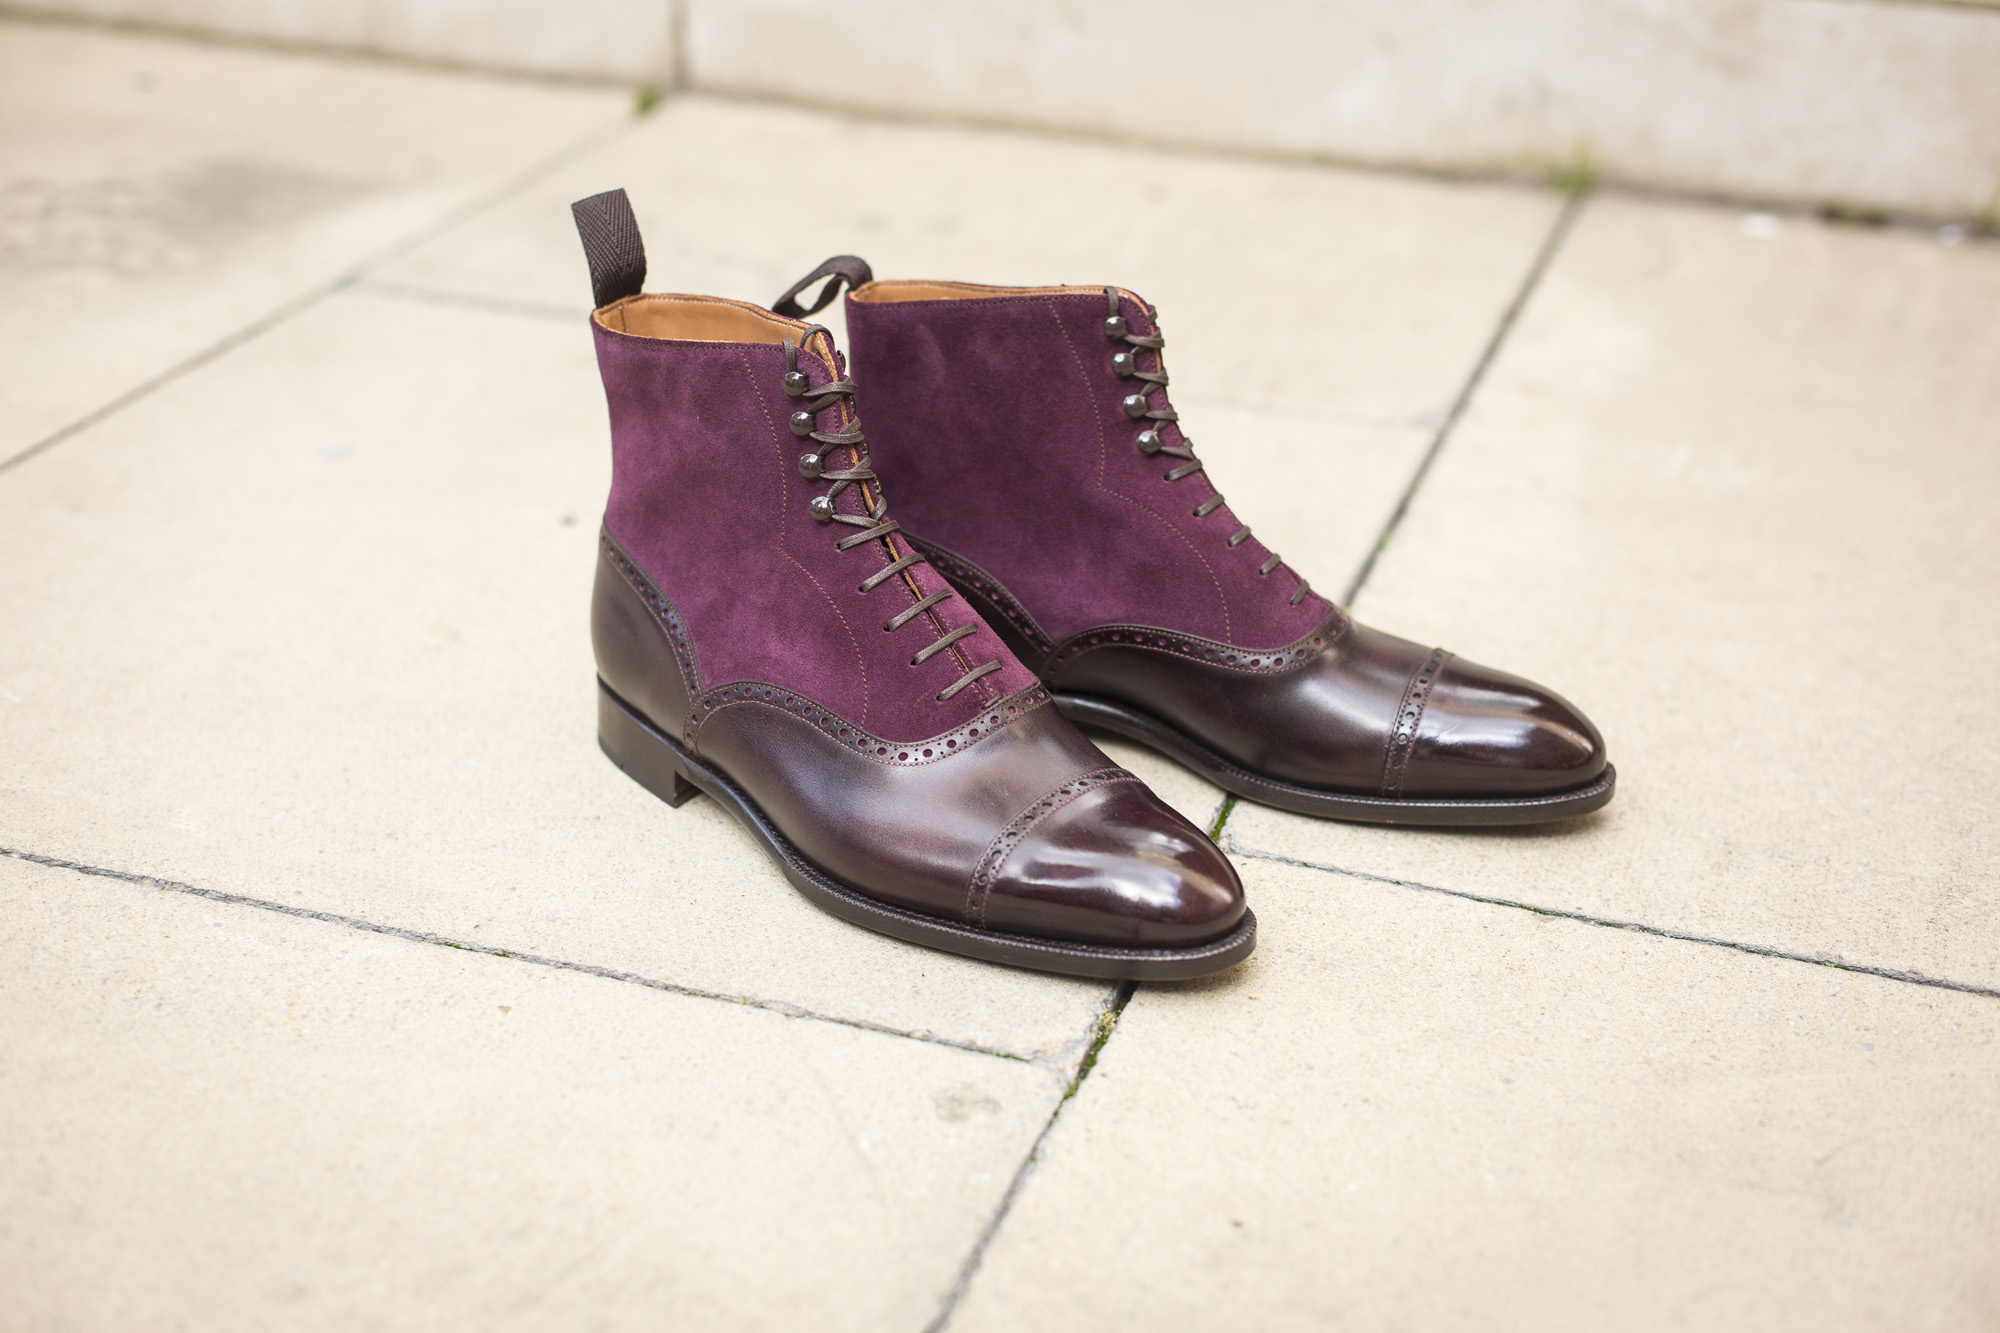 j-fitzpatrick-footwear-collection-28-september-2018-hero-00415.jpg